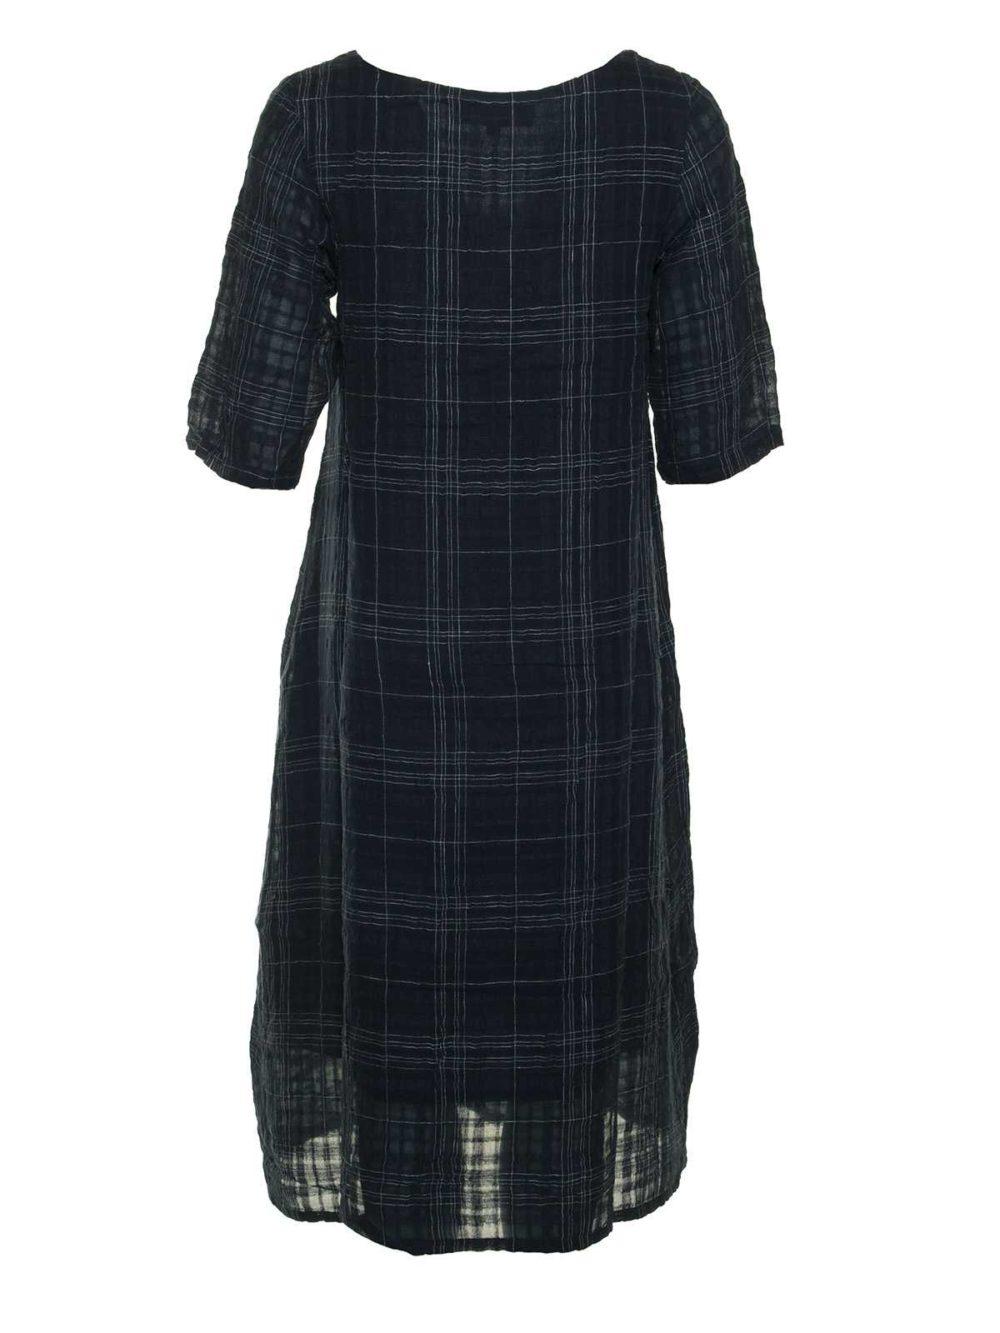 Kimaya Dress Kokomarina Katie Kerr Women's Clothing